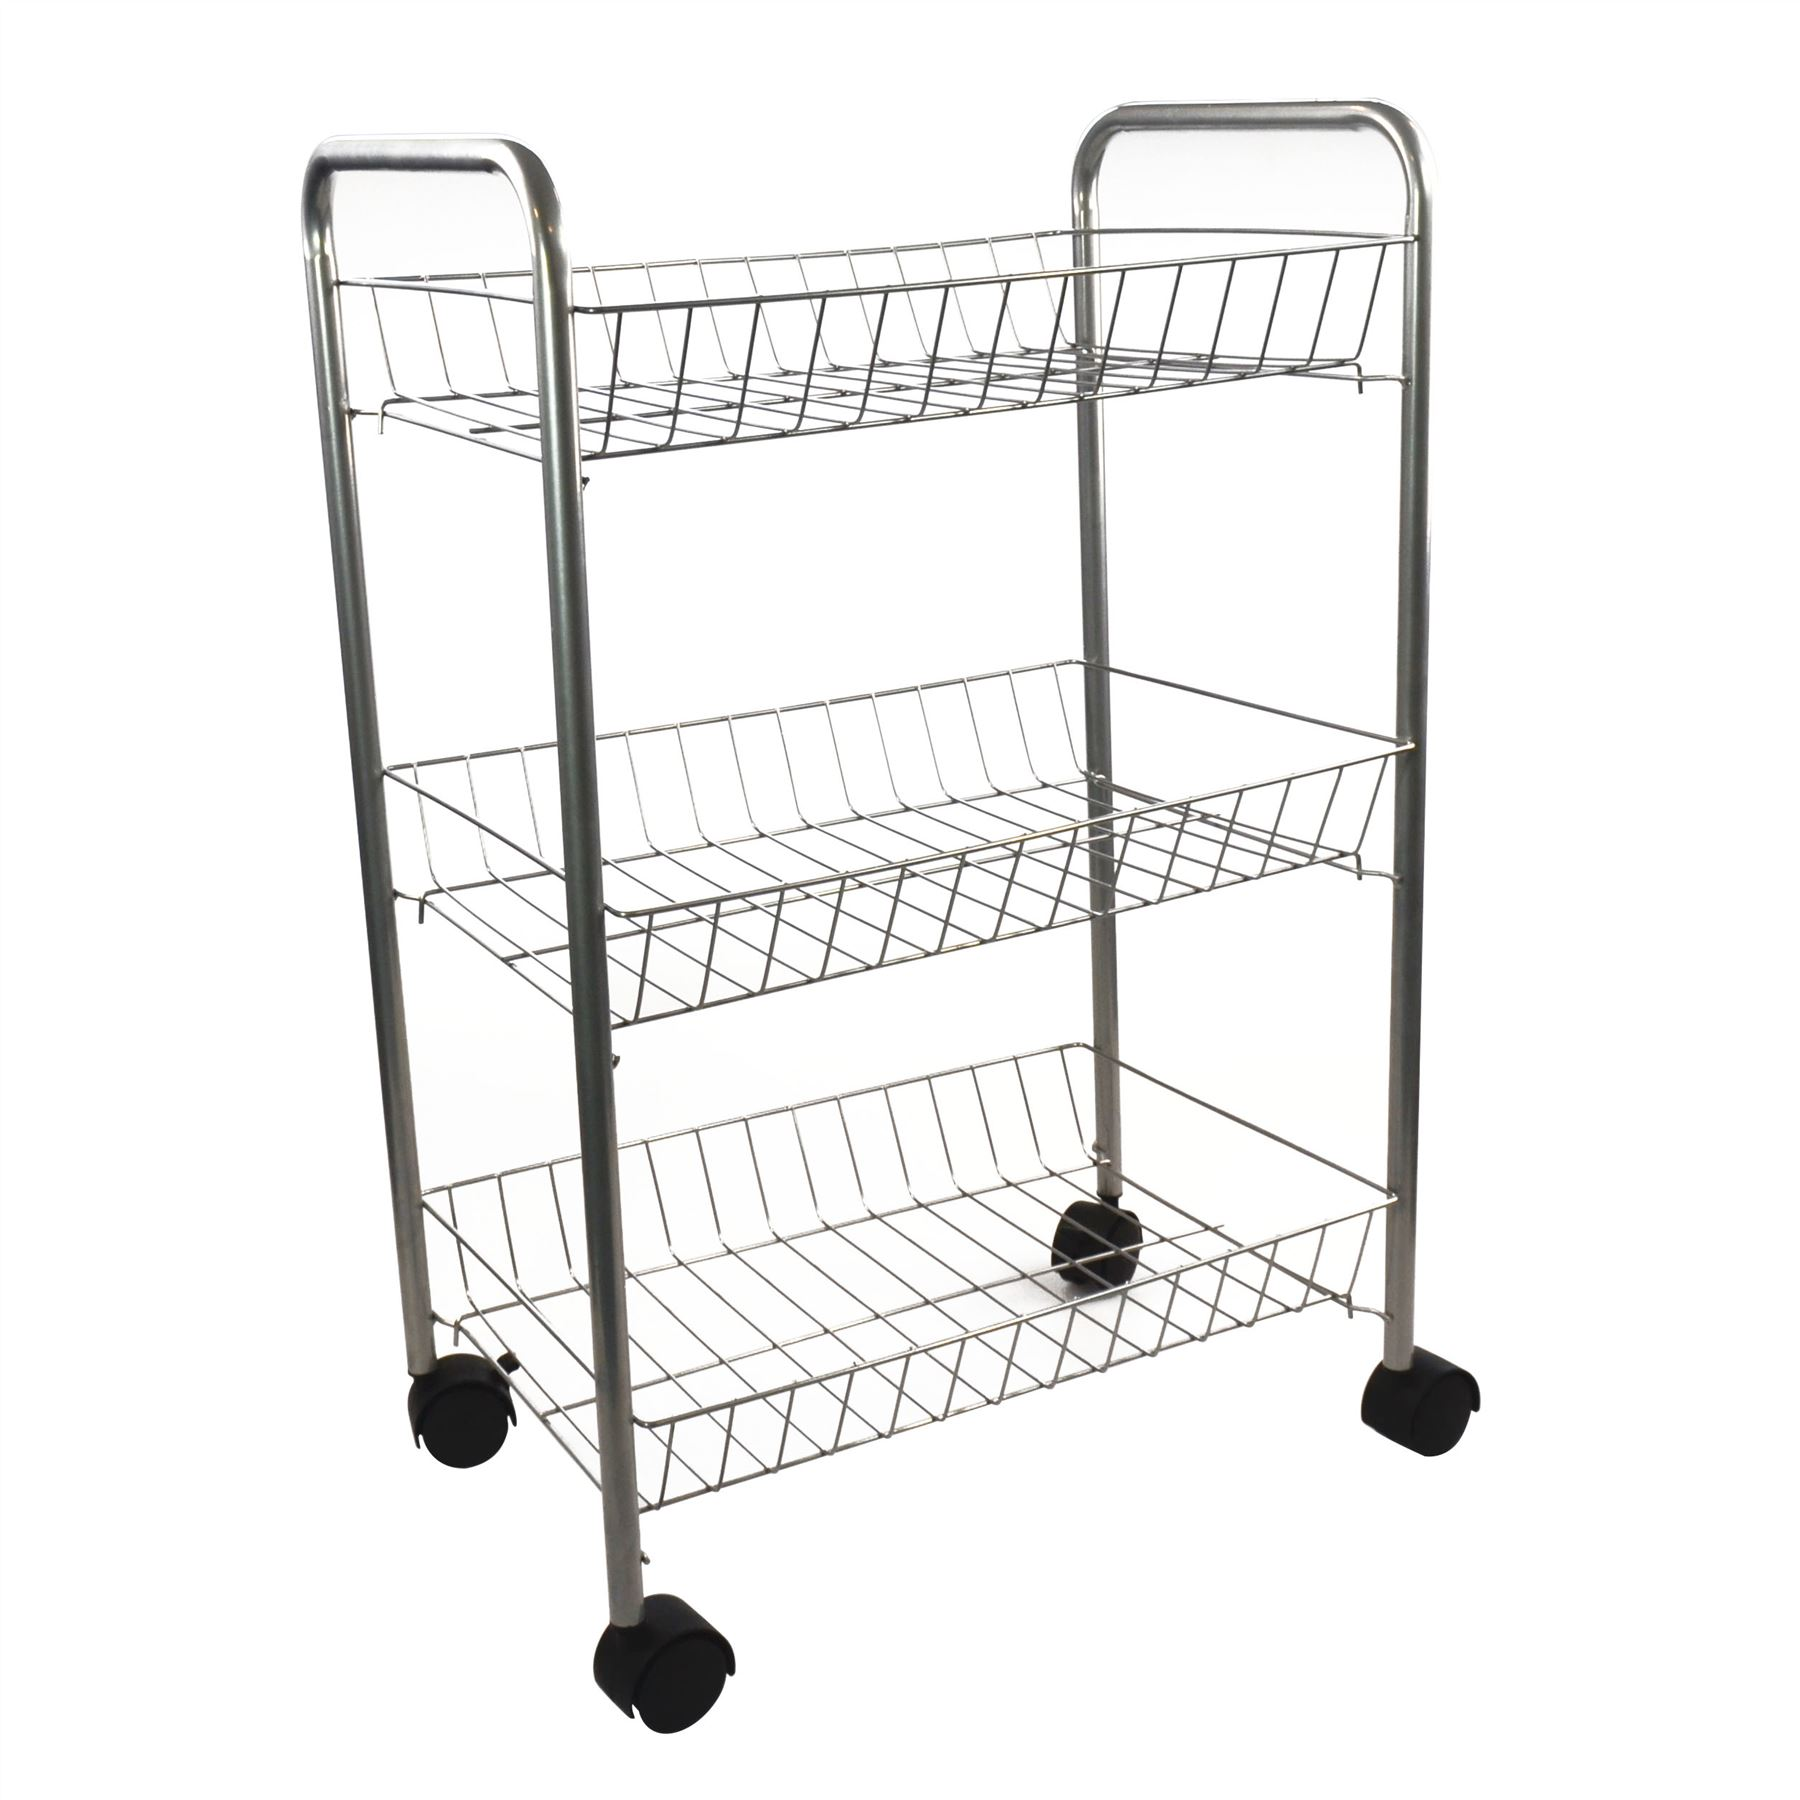 3 Tier Metal Kitchen Storage Trolley Vegetable Fruit Cart